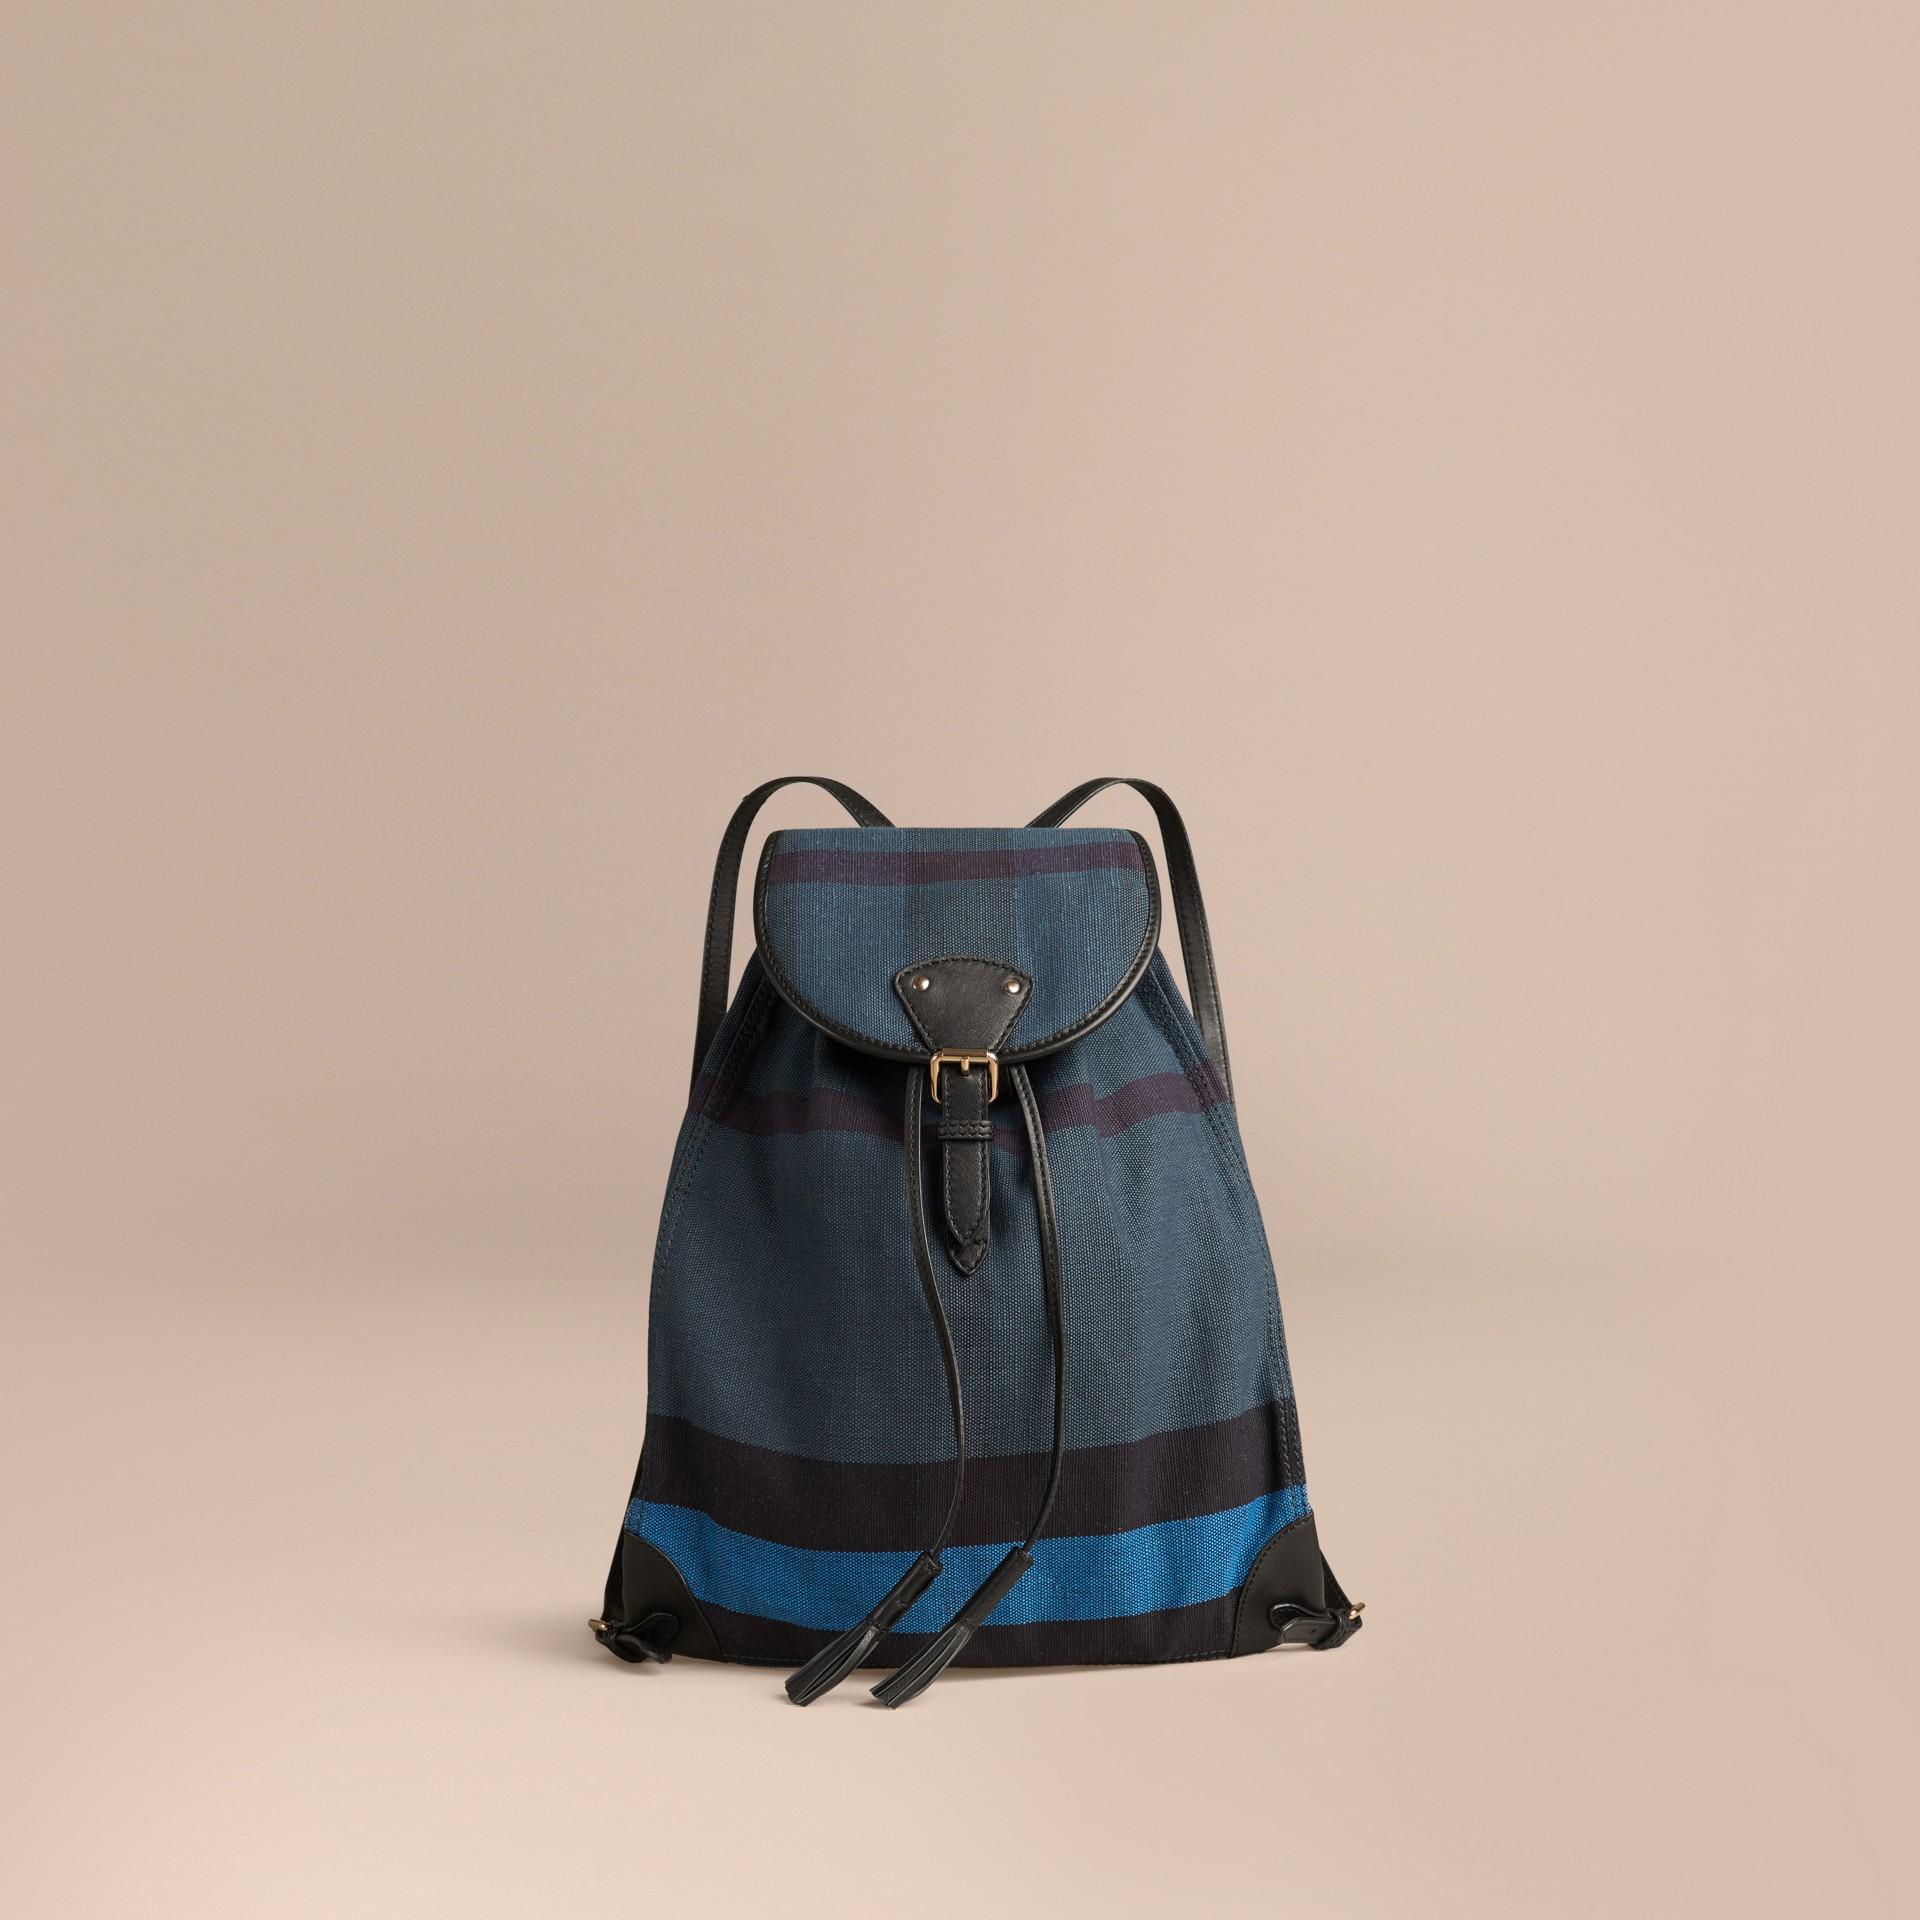 Bleu ultramarine Sac à dos en tissu Canvas check surteint Bleu Ultramarine - photo de la galerie 1